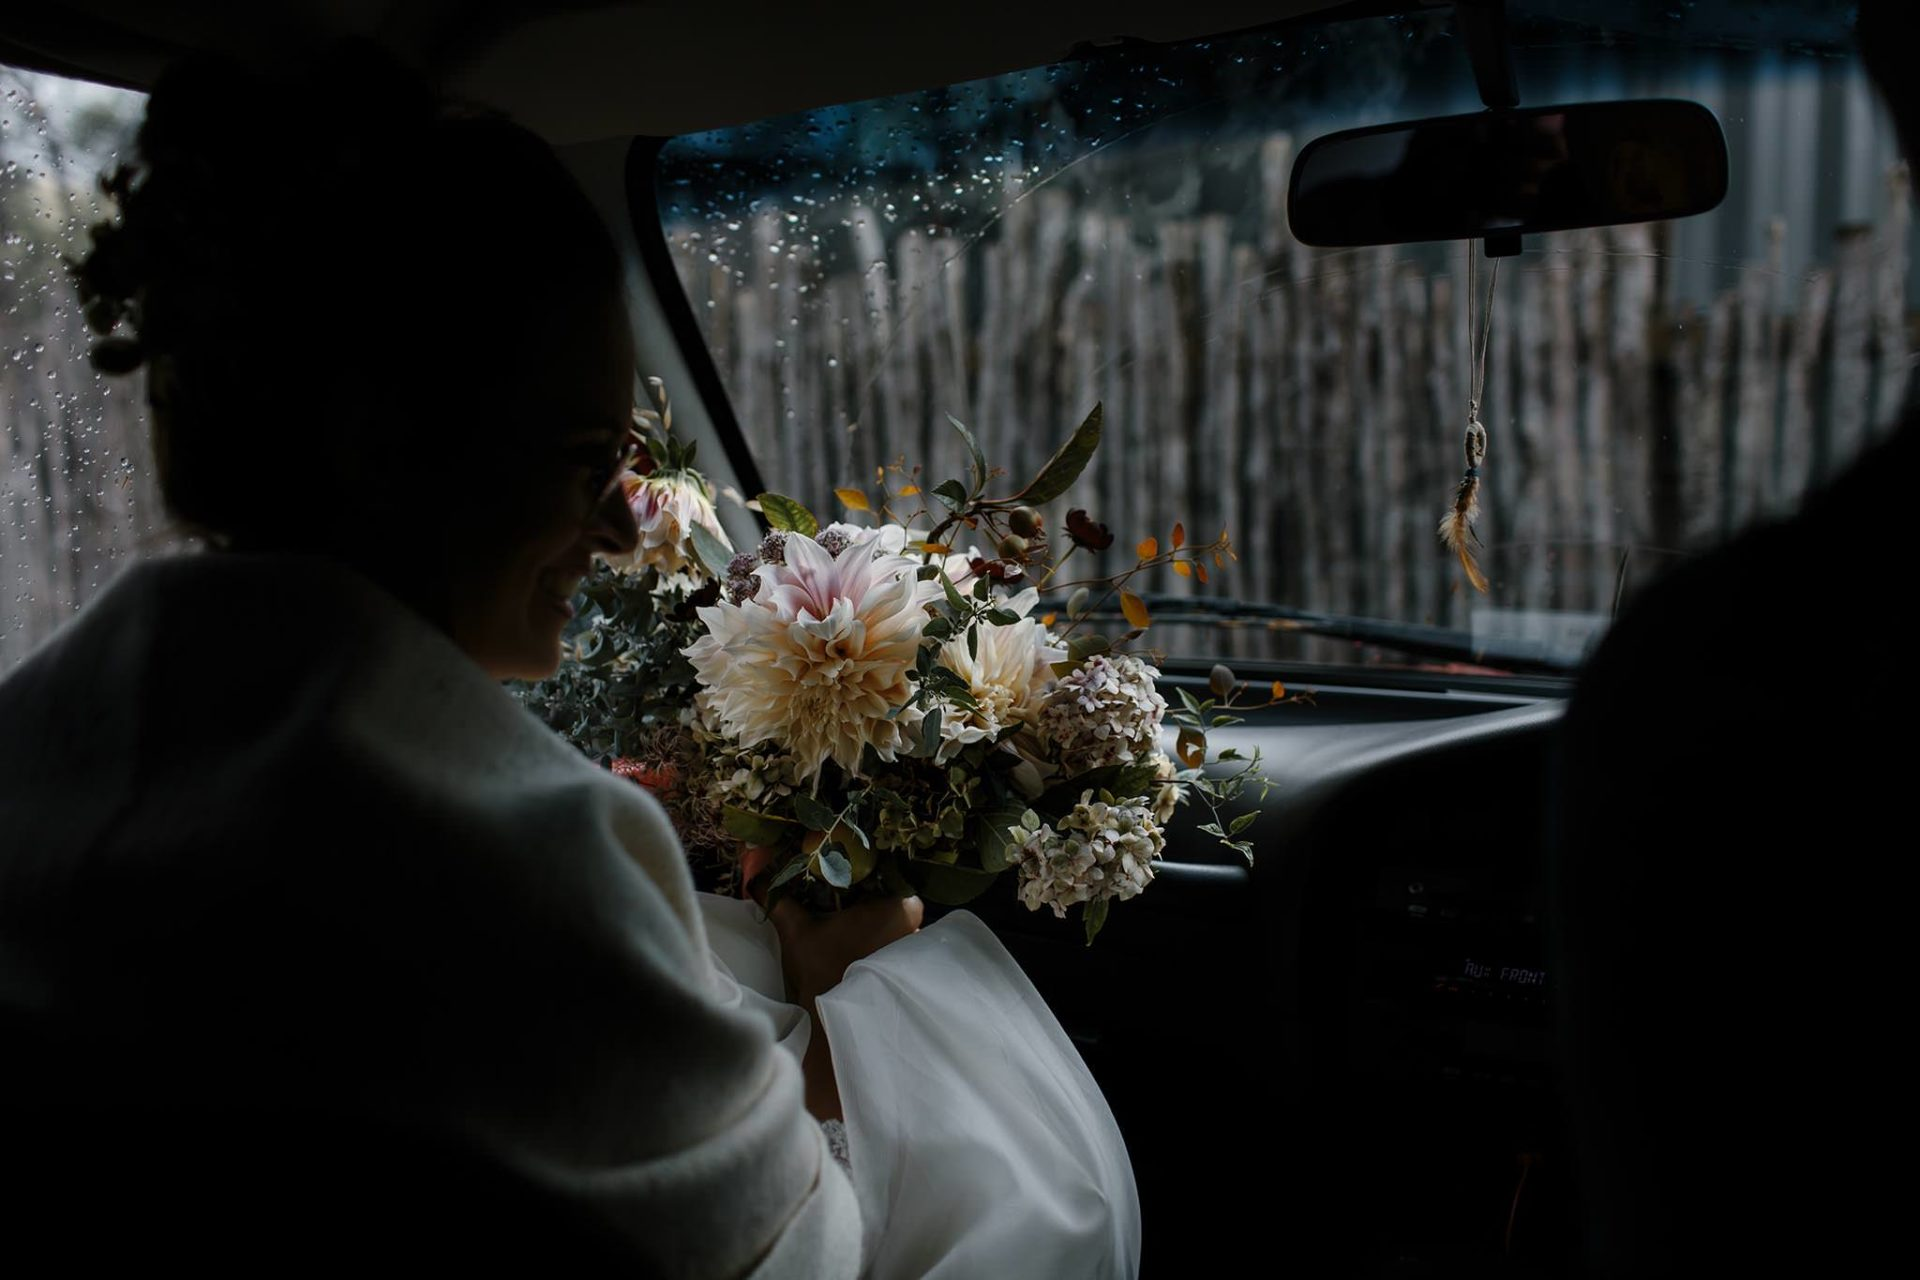 bride-tasmania wedding flowers-primula floral styling-elopement pump house point-eukalypt-miniature apples-headpiece